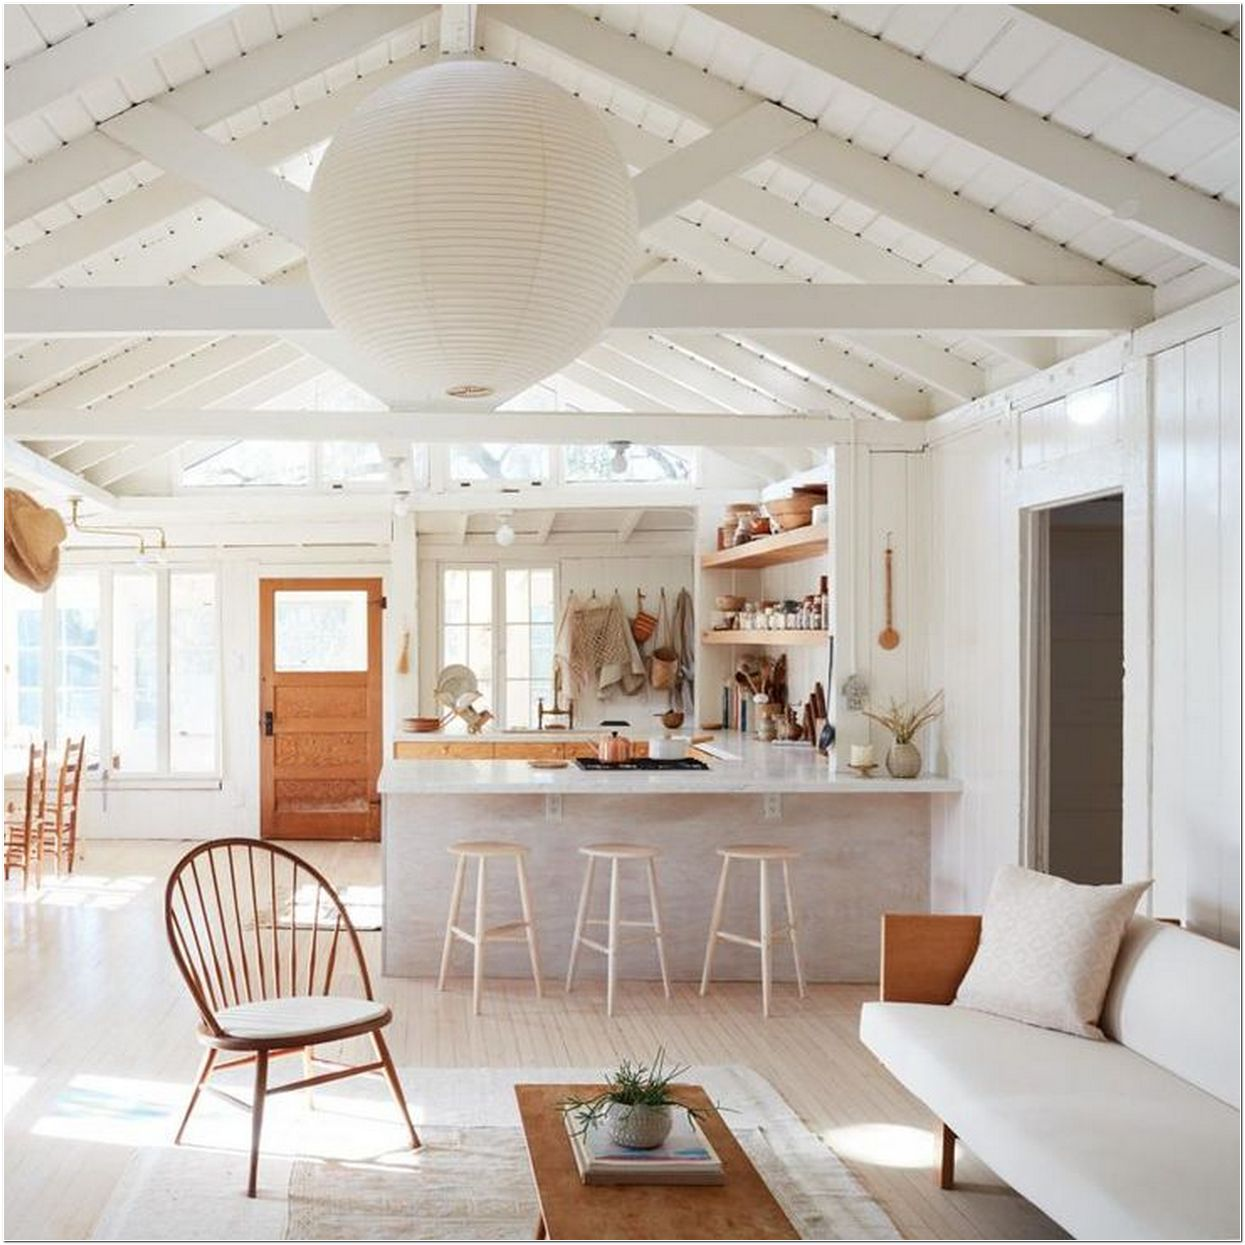 78 California Dreaming – The Lido House in Newport Beach